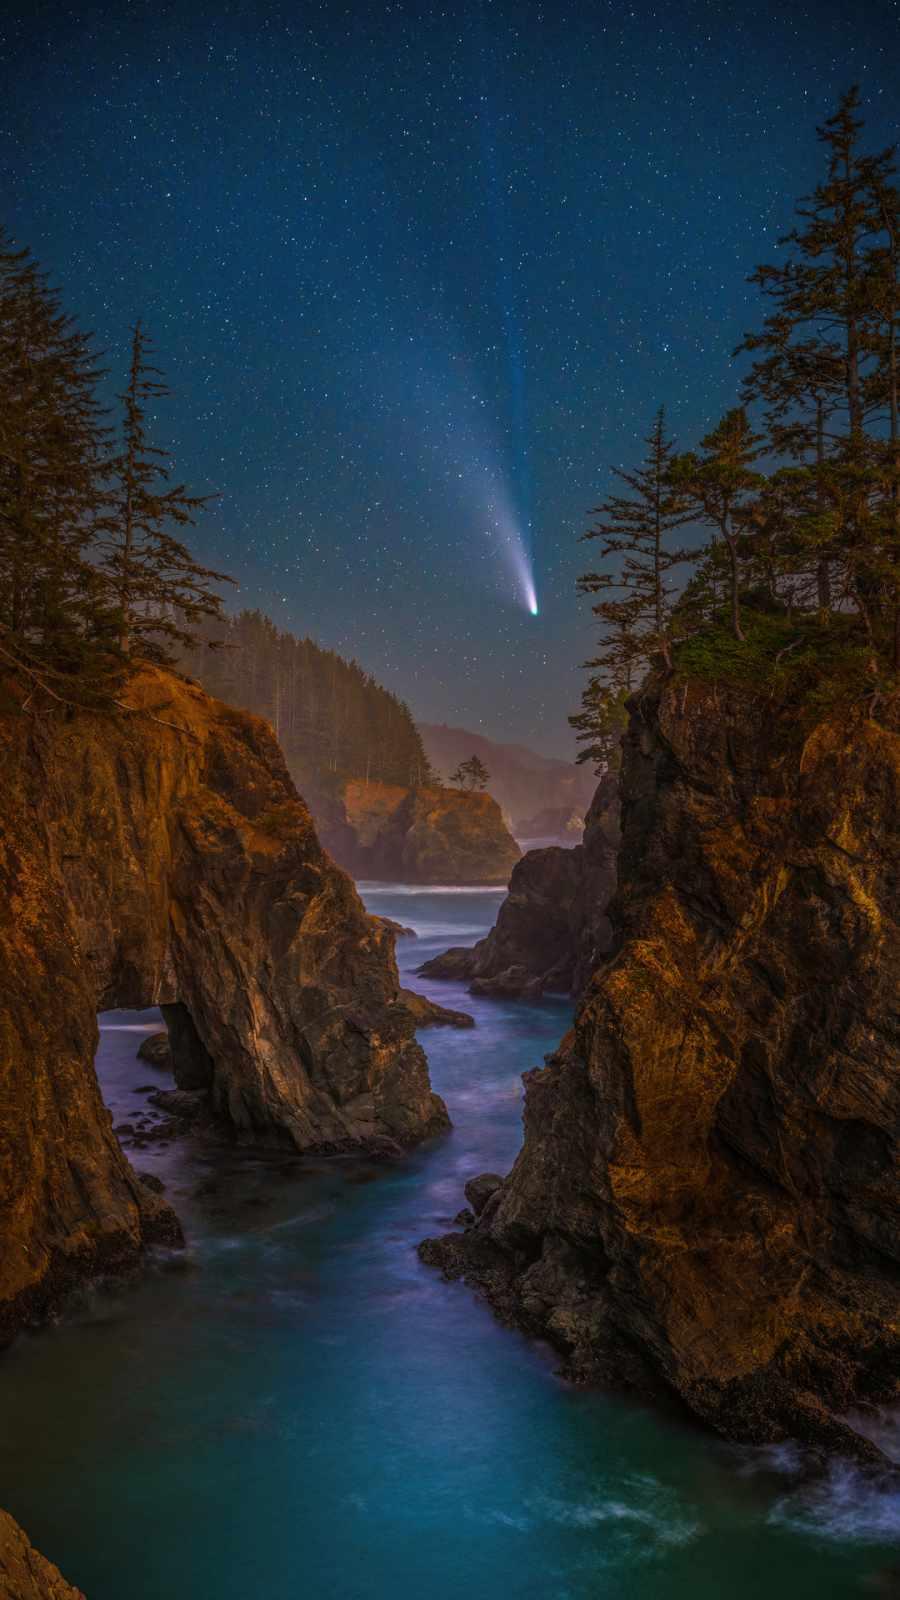 coast stars scenery oregon night trees